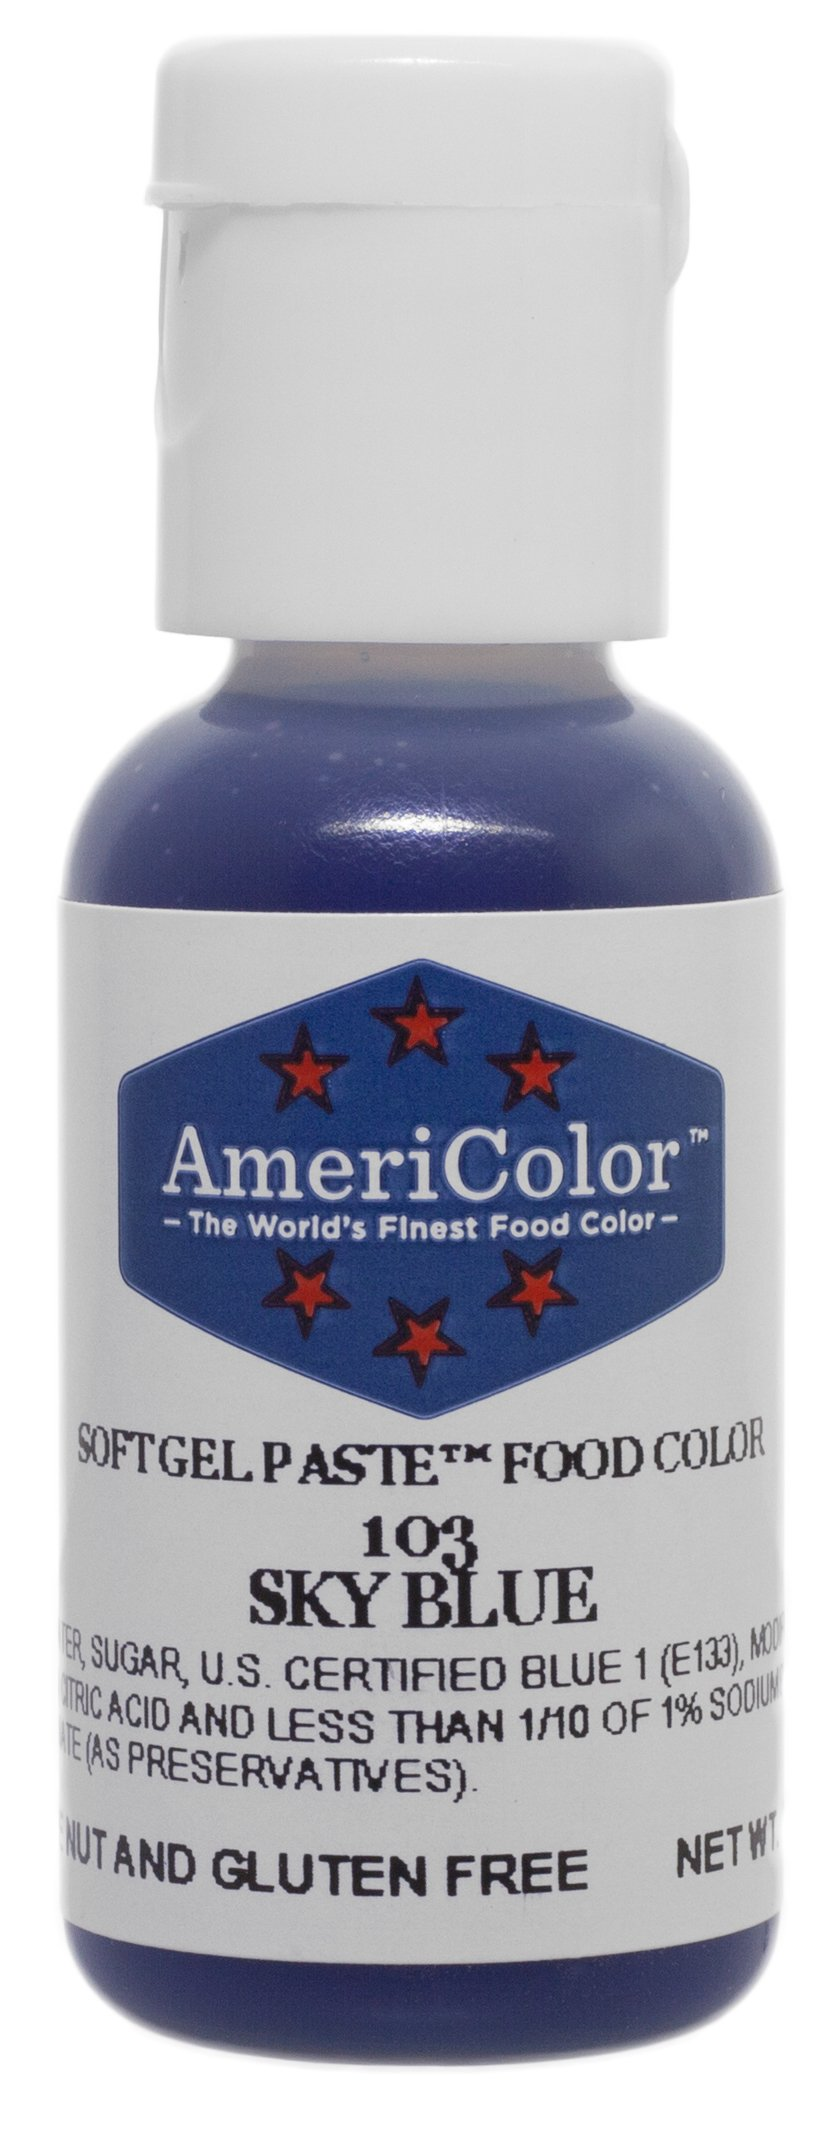 Americolor Soft Gel Paste Food Color.75-Ounce, Sky Blue